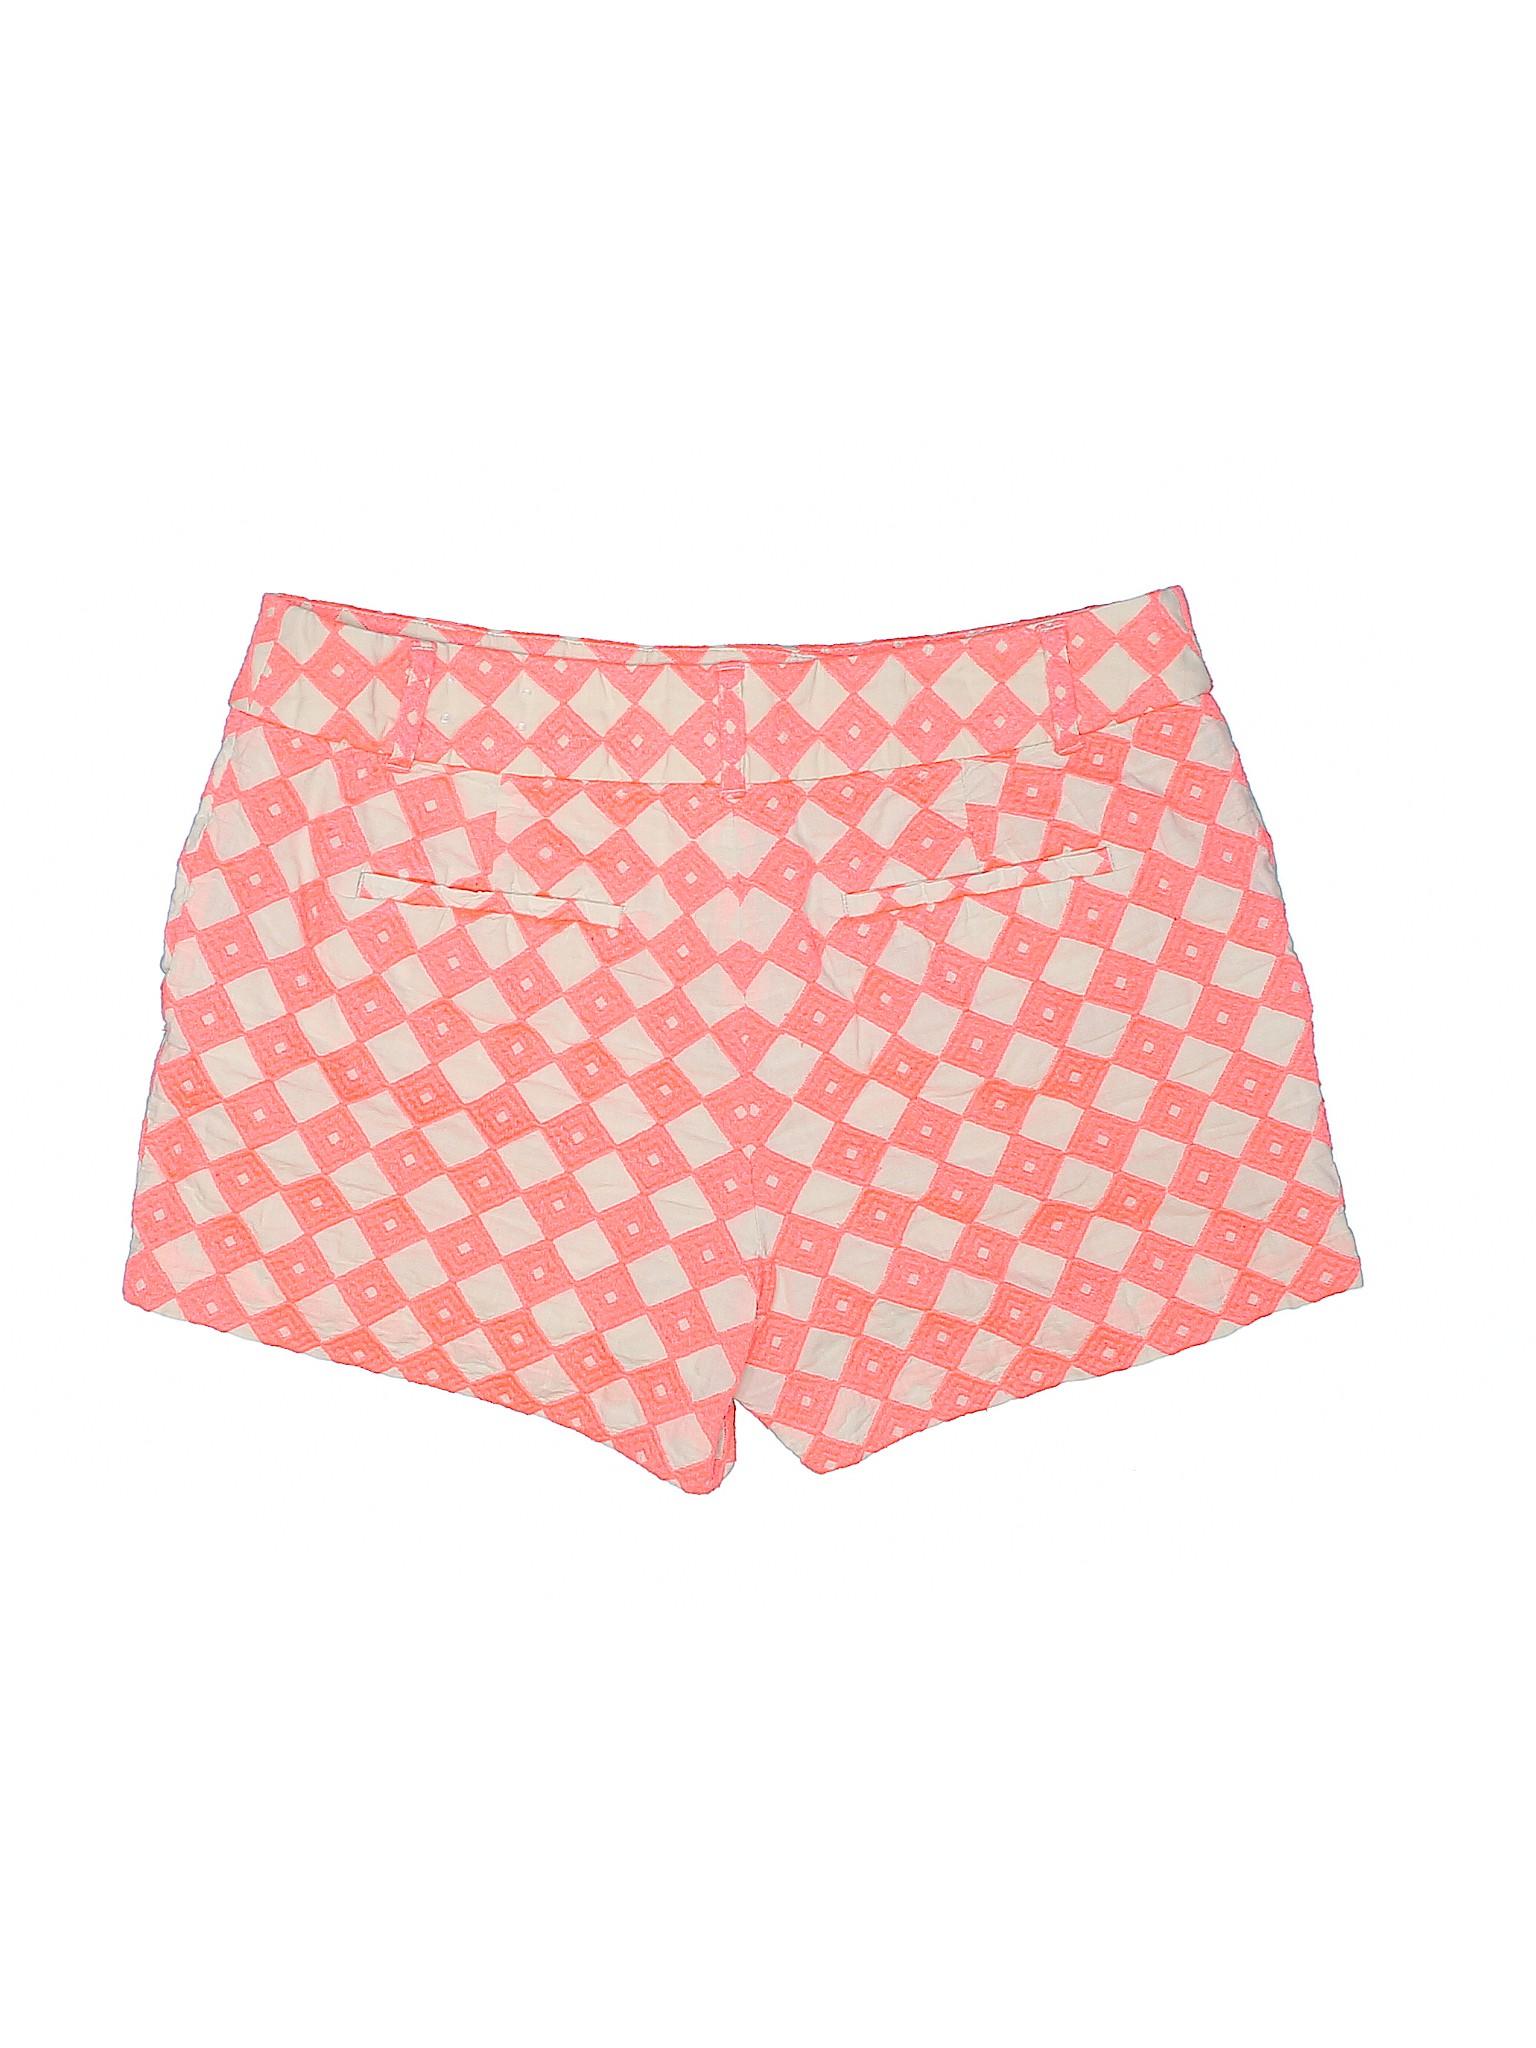 Khaki Shorts Boutique Ann leisure Taylor LOFT nAAwYvIgq